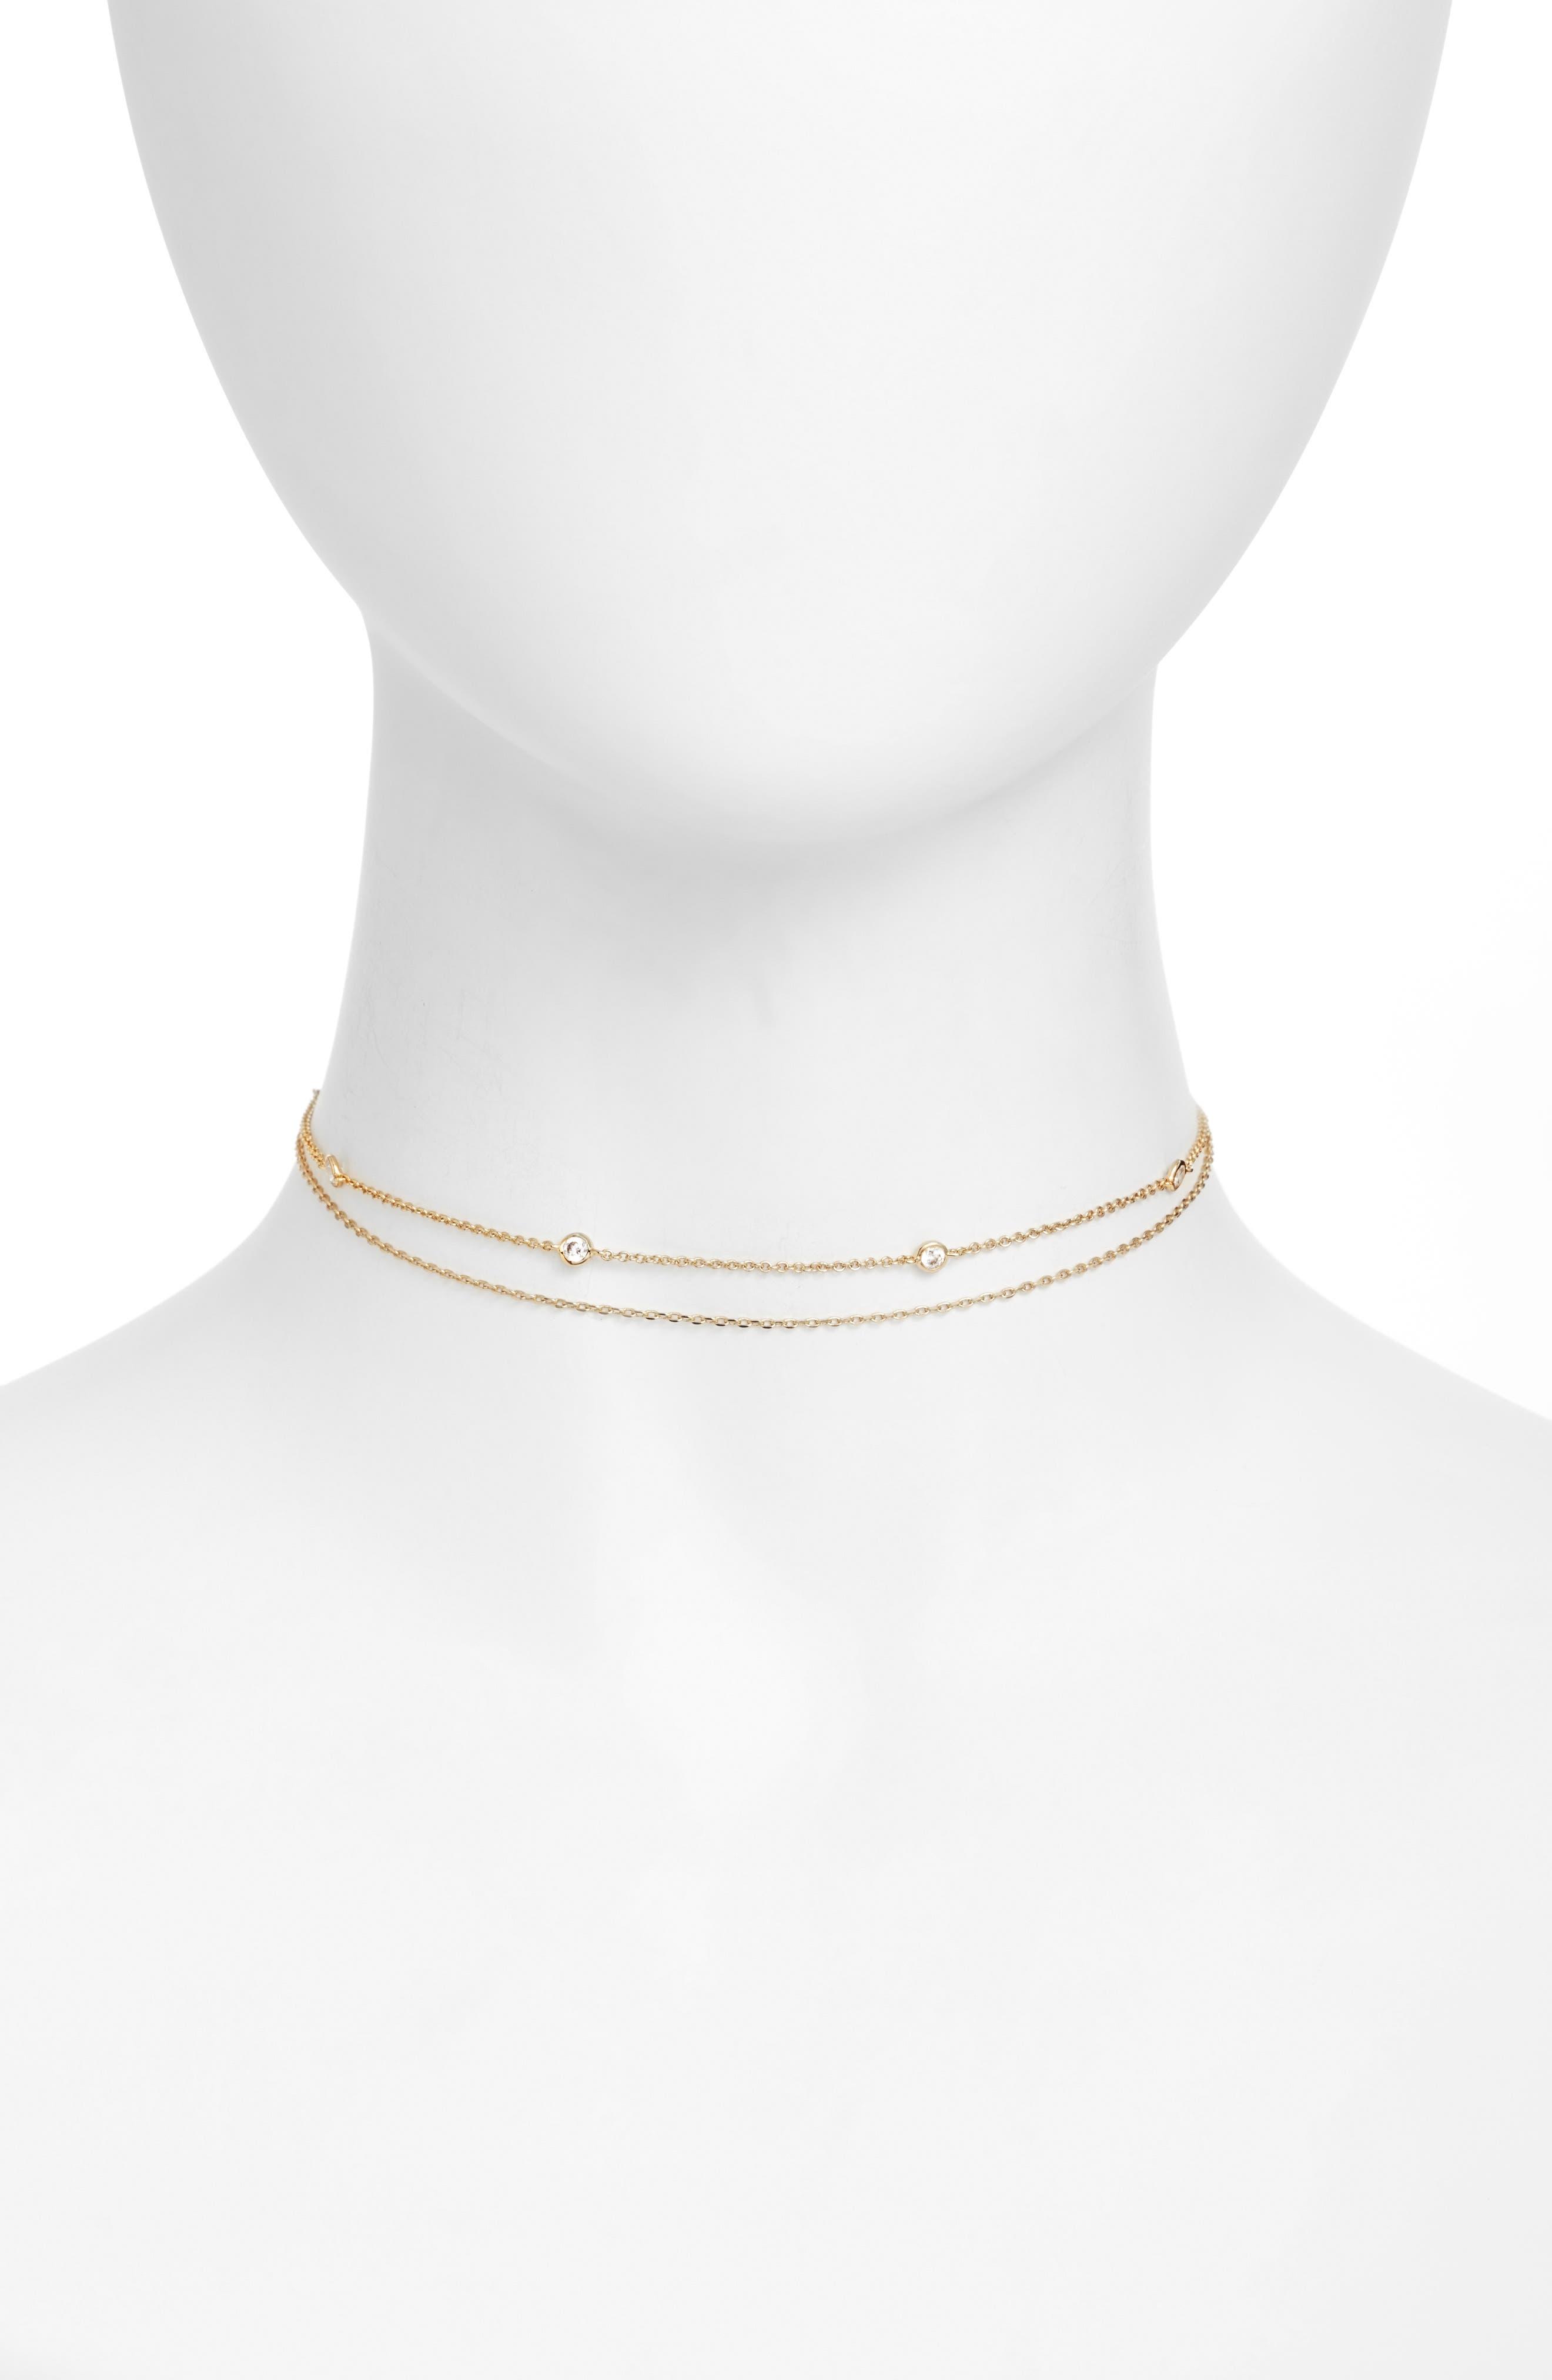 JULES SMITH Crimson Chain Choker, Main, color, GOLD/ CLEAR